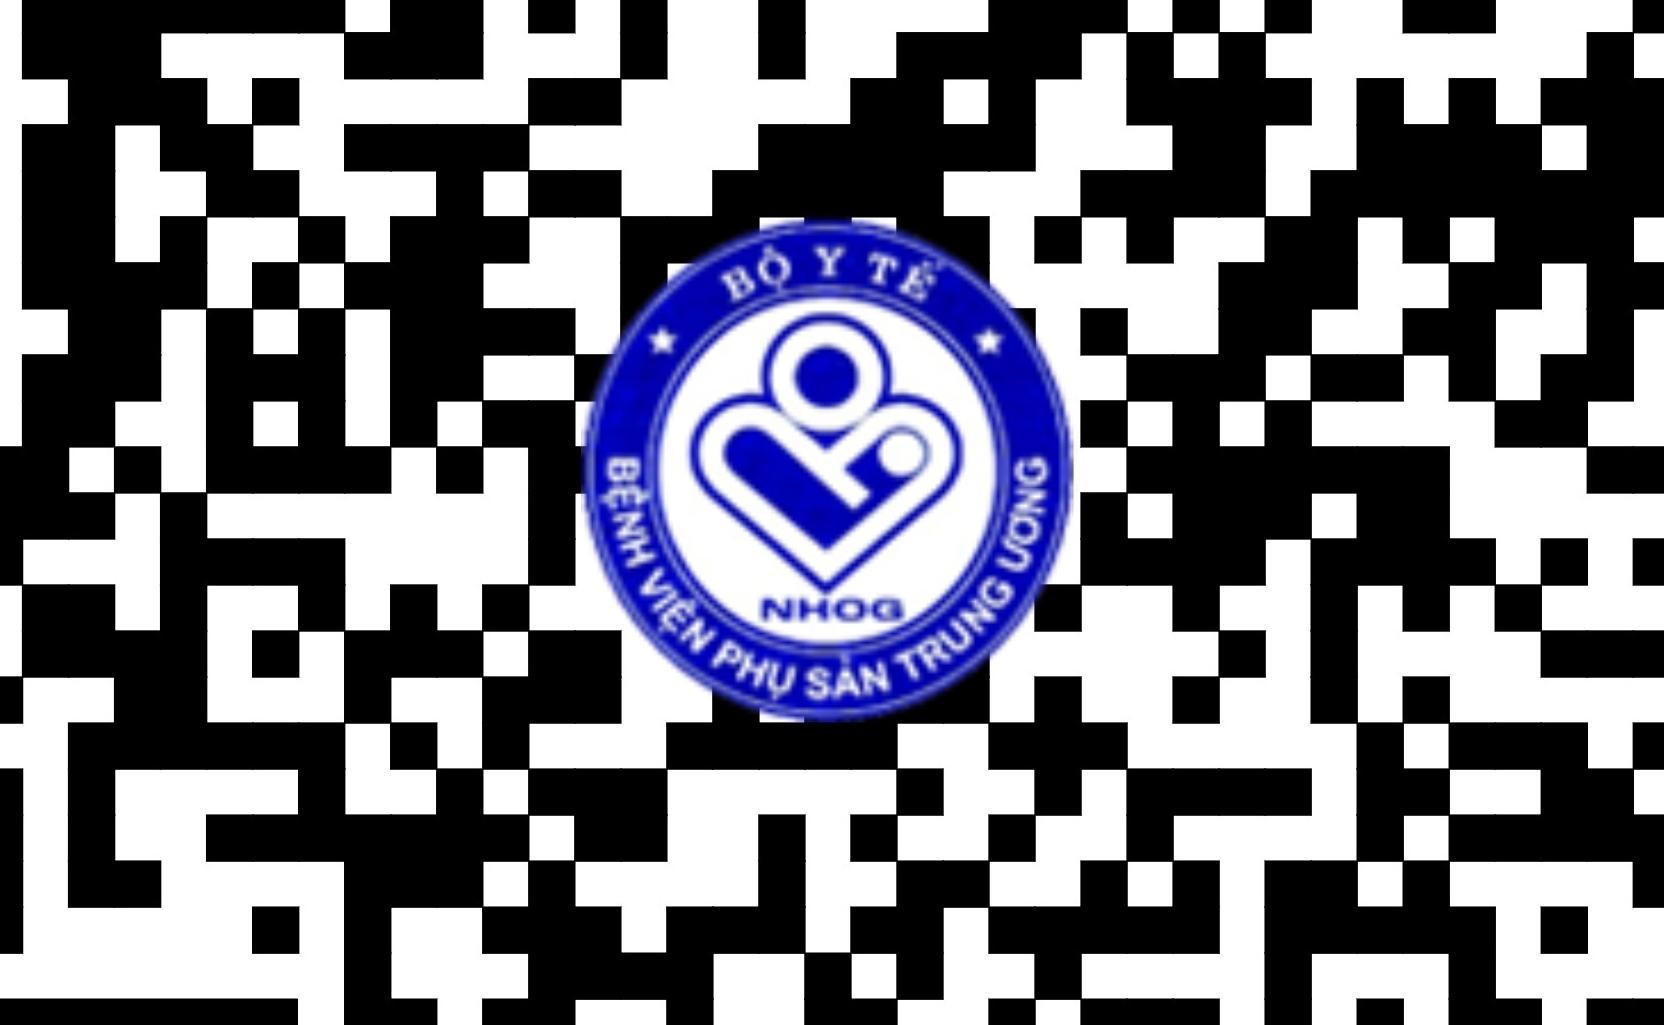 http://petrotimesbeta.mastercms.org/stores/news_dataimages/vtkien/022021/08/09/croped/QR_code.jpg